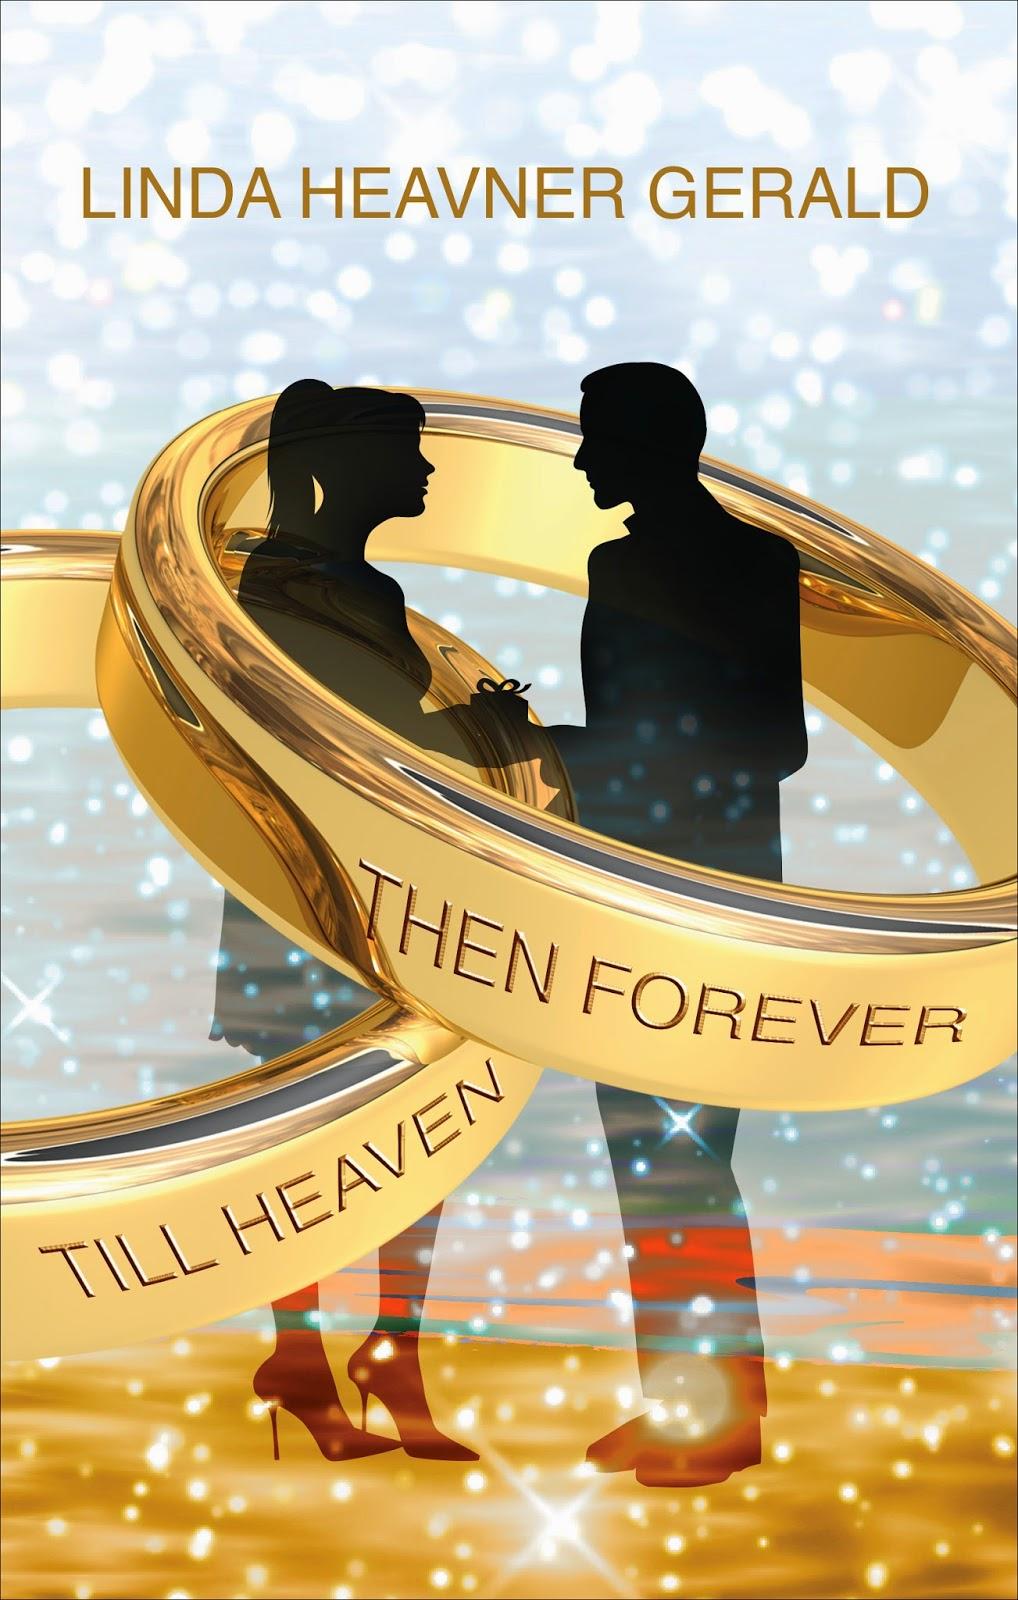 http://www.amazon.com/Heaven-Forever-Linda-Heavner-Gerald/dp/162994355X/ref=tmm_pap_title_0?ie=UTF8&qid=1412362868&sr=1-1